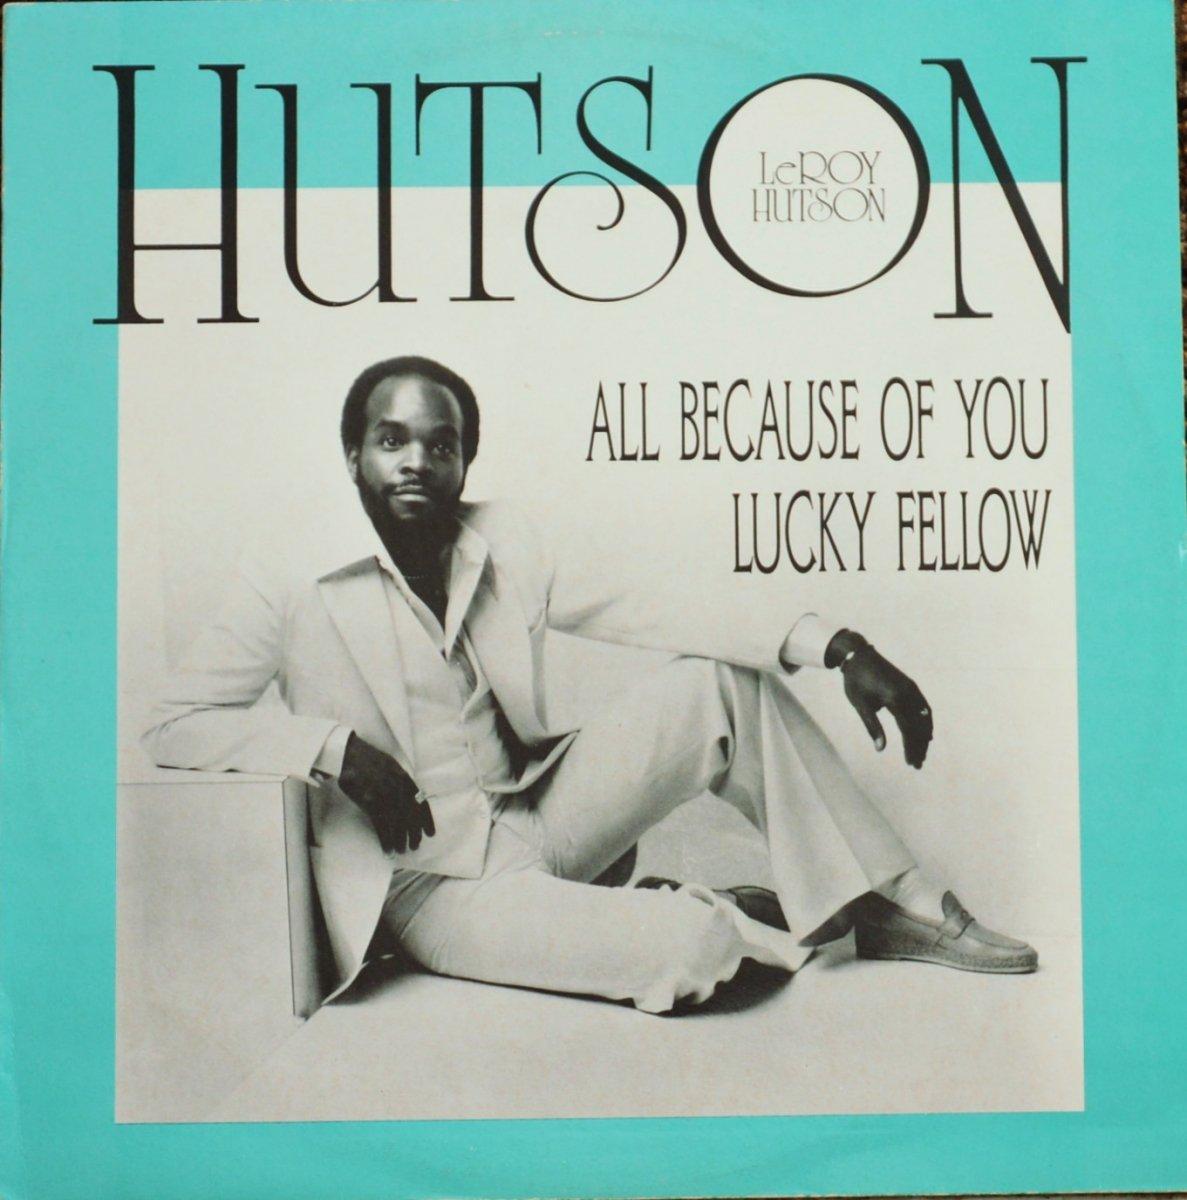 LEROY HUTSON / ALL BECAUSE OF YOU / LUCKY FELLOW (12